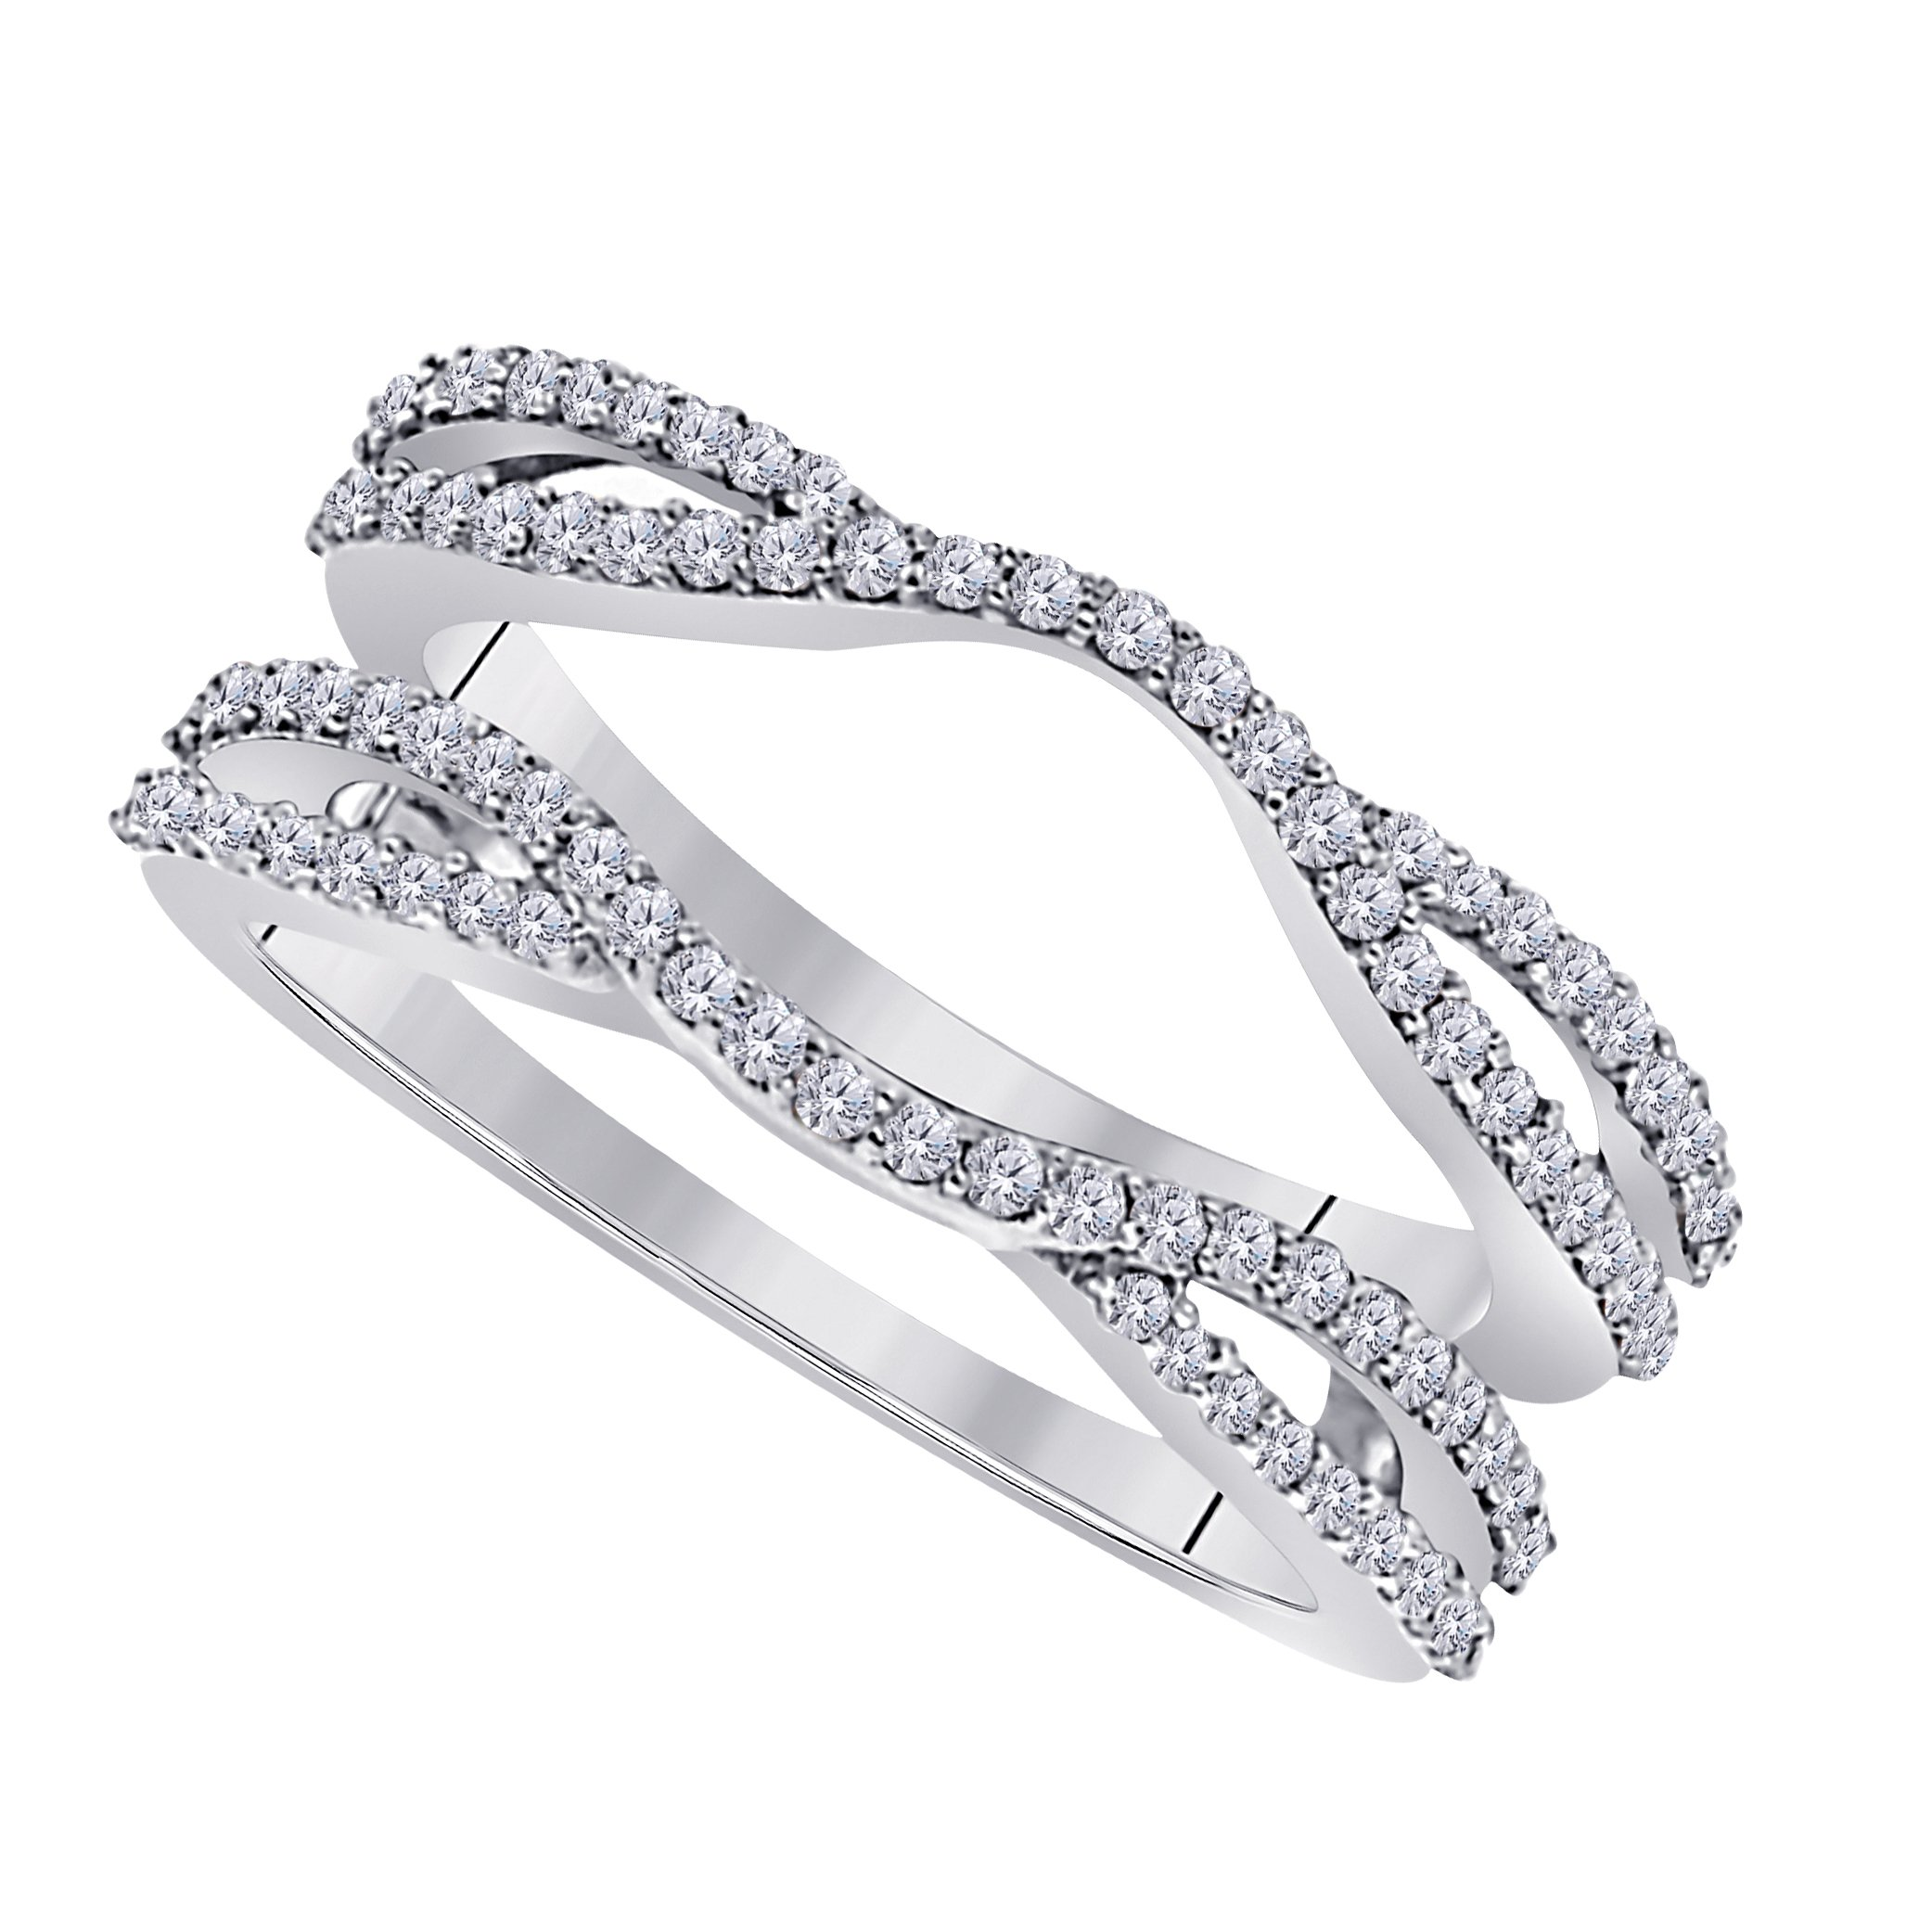 Jewelryhub 0.50 Ctw 14K White Gold Plated Round Cut White CZ Diamond Alloy Ladies Anniversary Wedding Band Enhancer Guard Double Chevron Ring